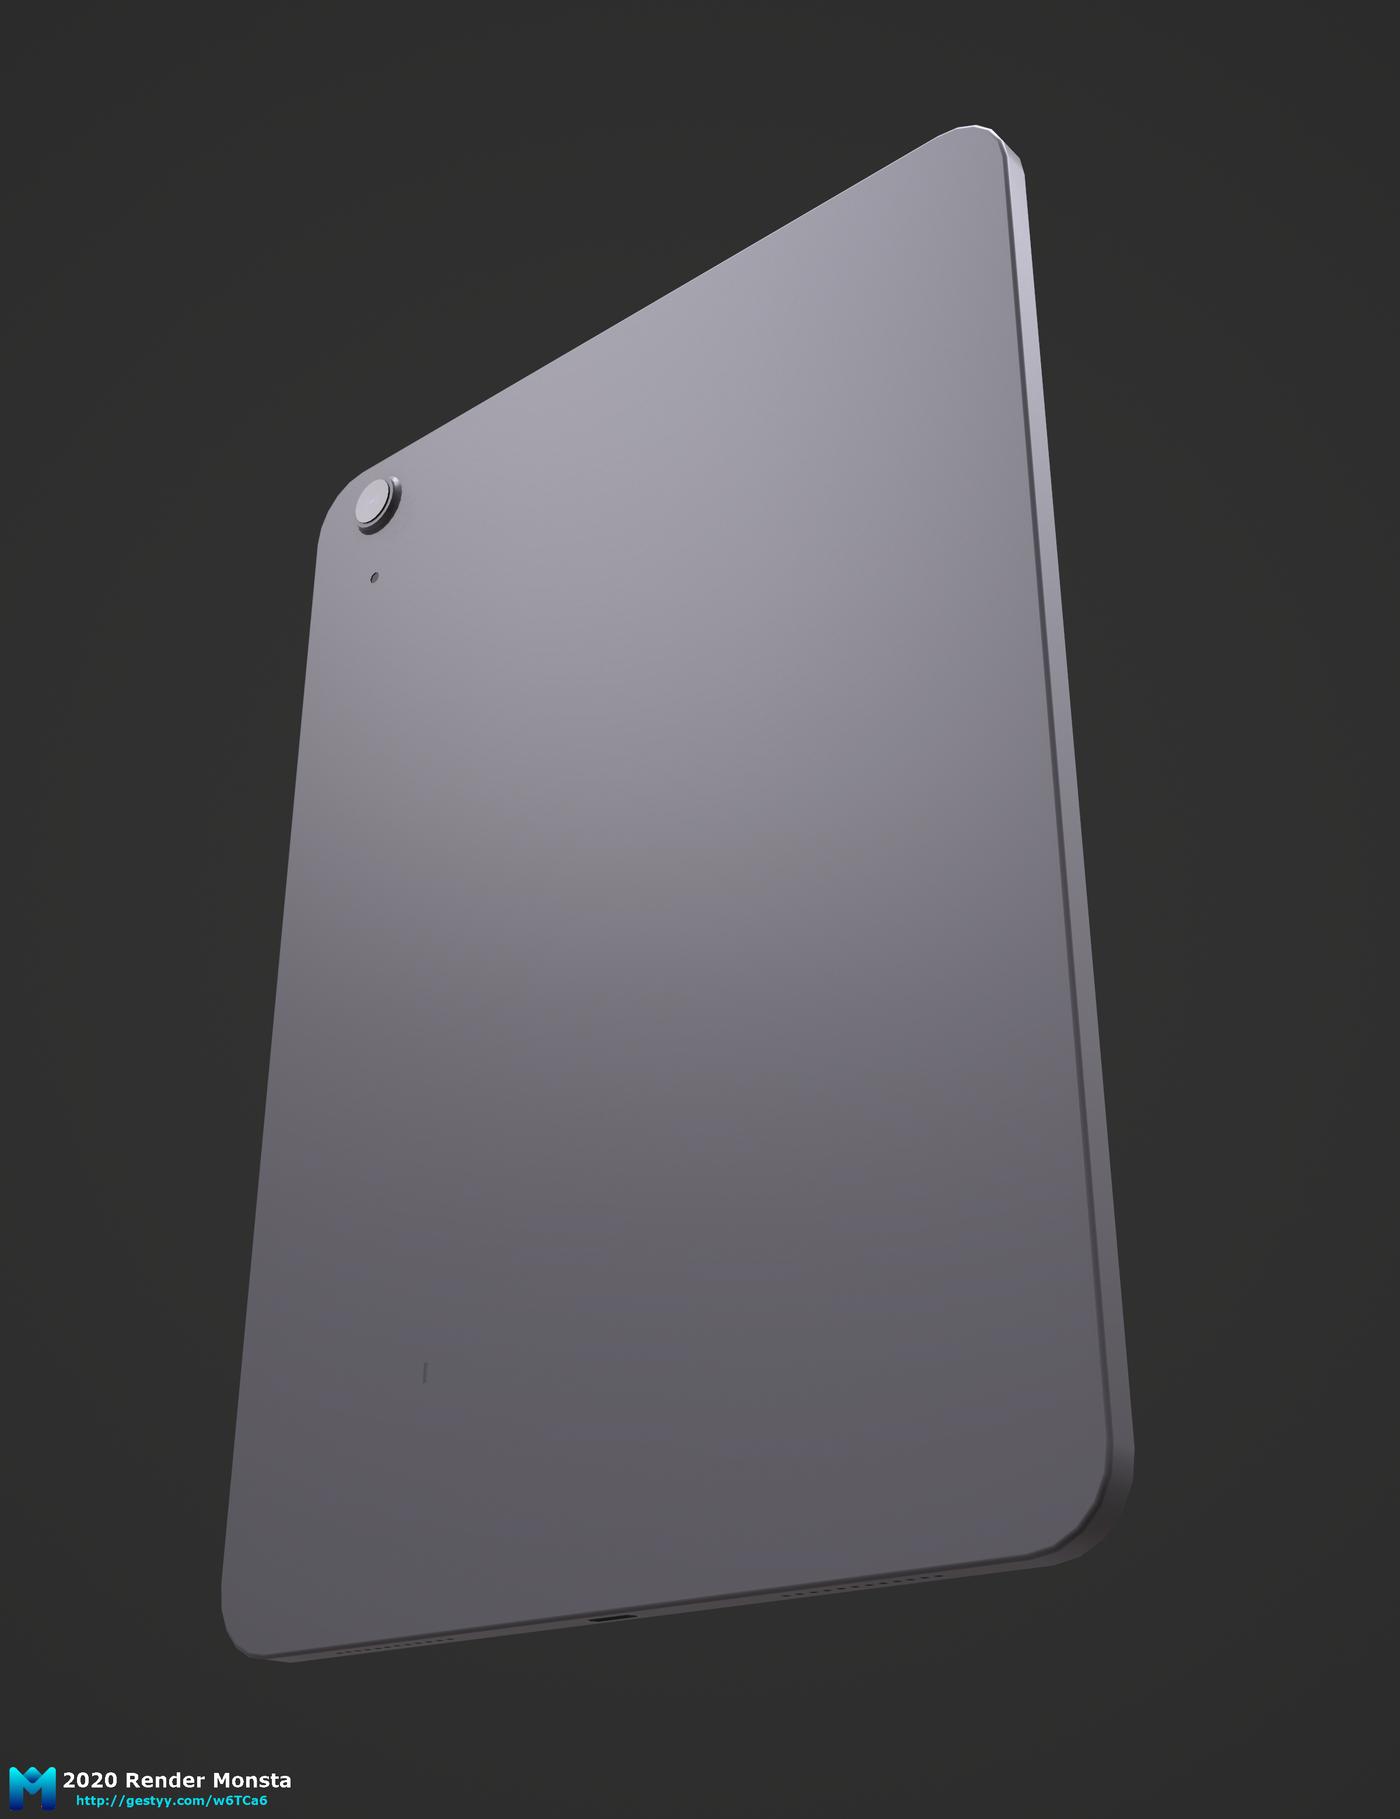 2020 Apple Ipad air pbr lowpoly model